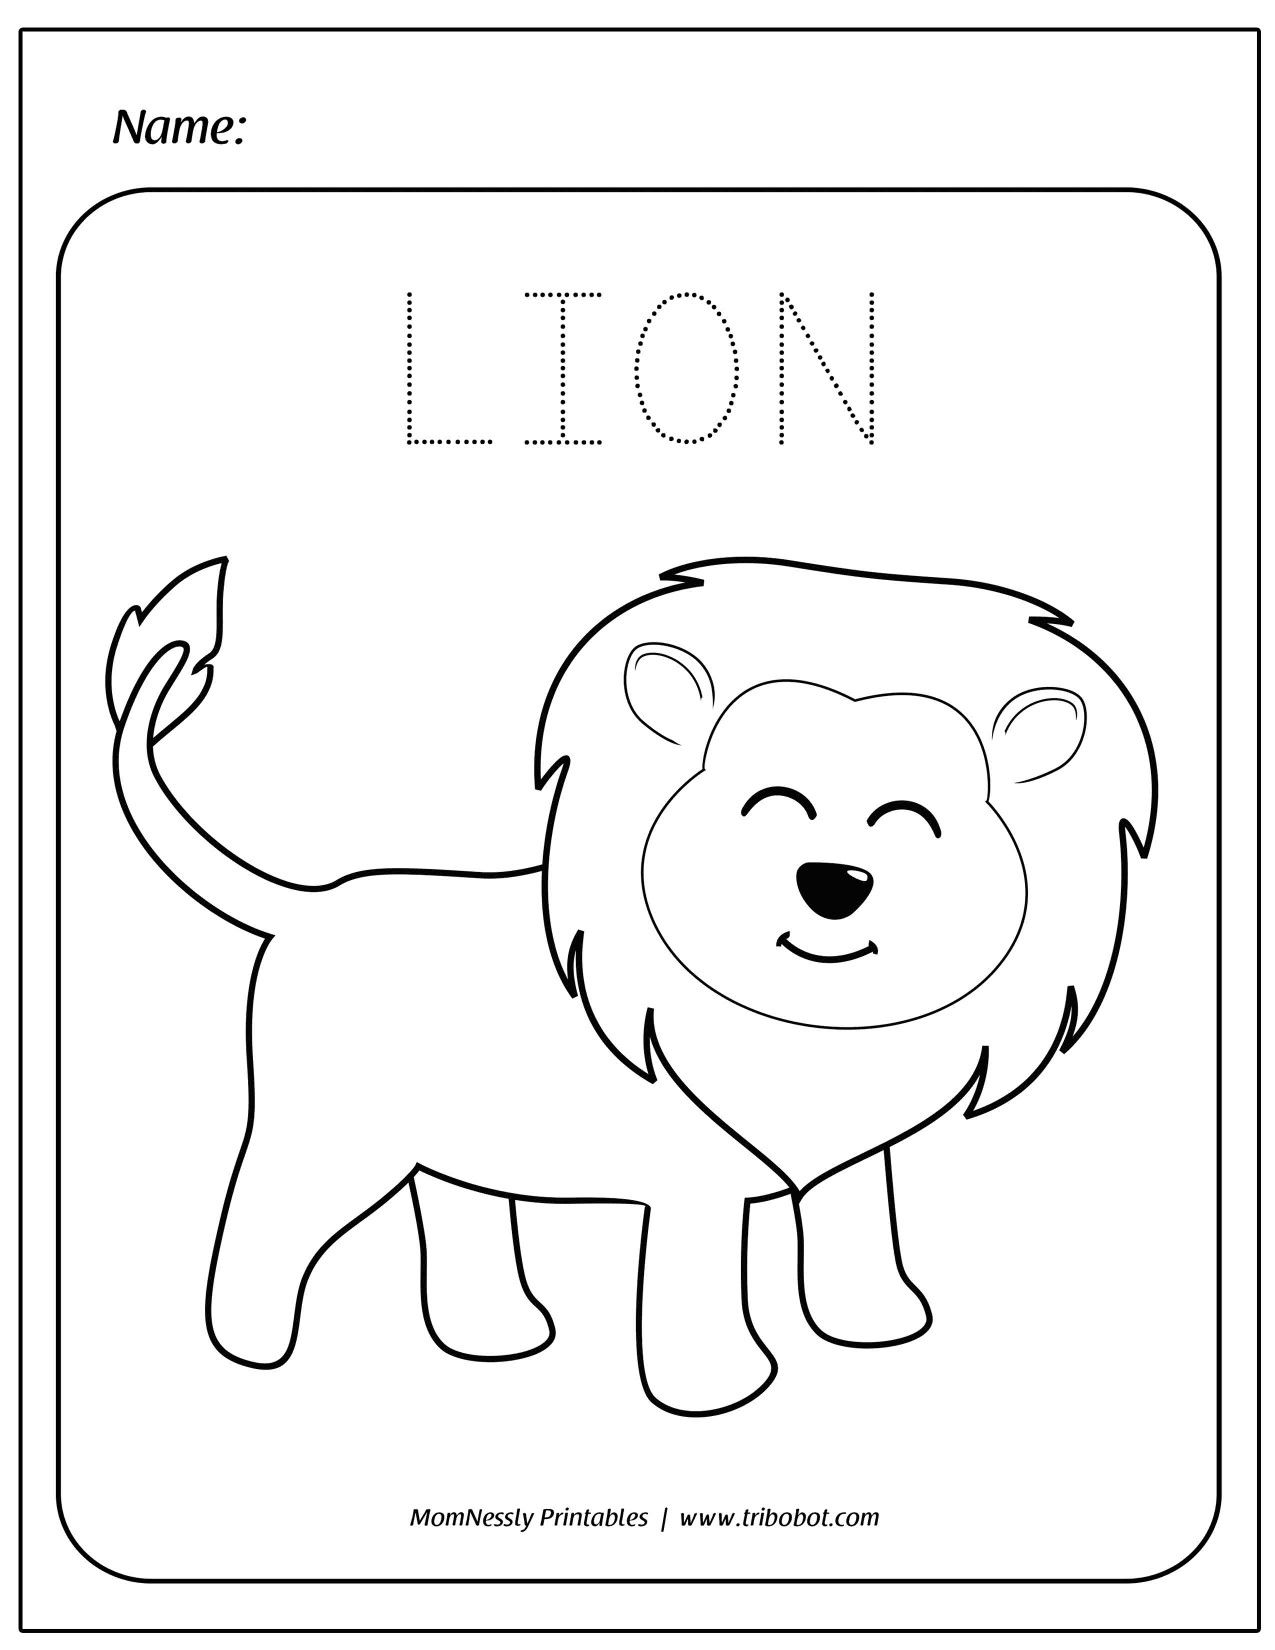 Coloring Pages For Kids Https Tribobot Com Coloring Pages For Kids Free Preschool Printables Worksheets For Kids